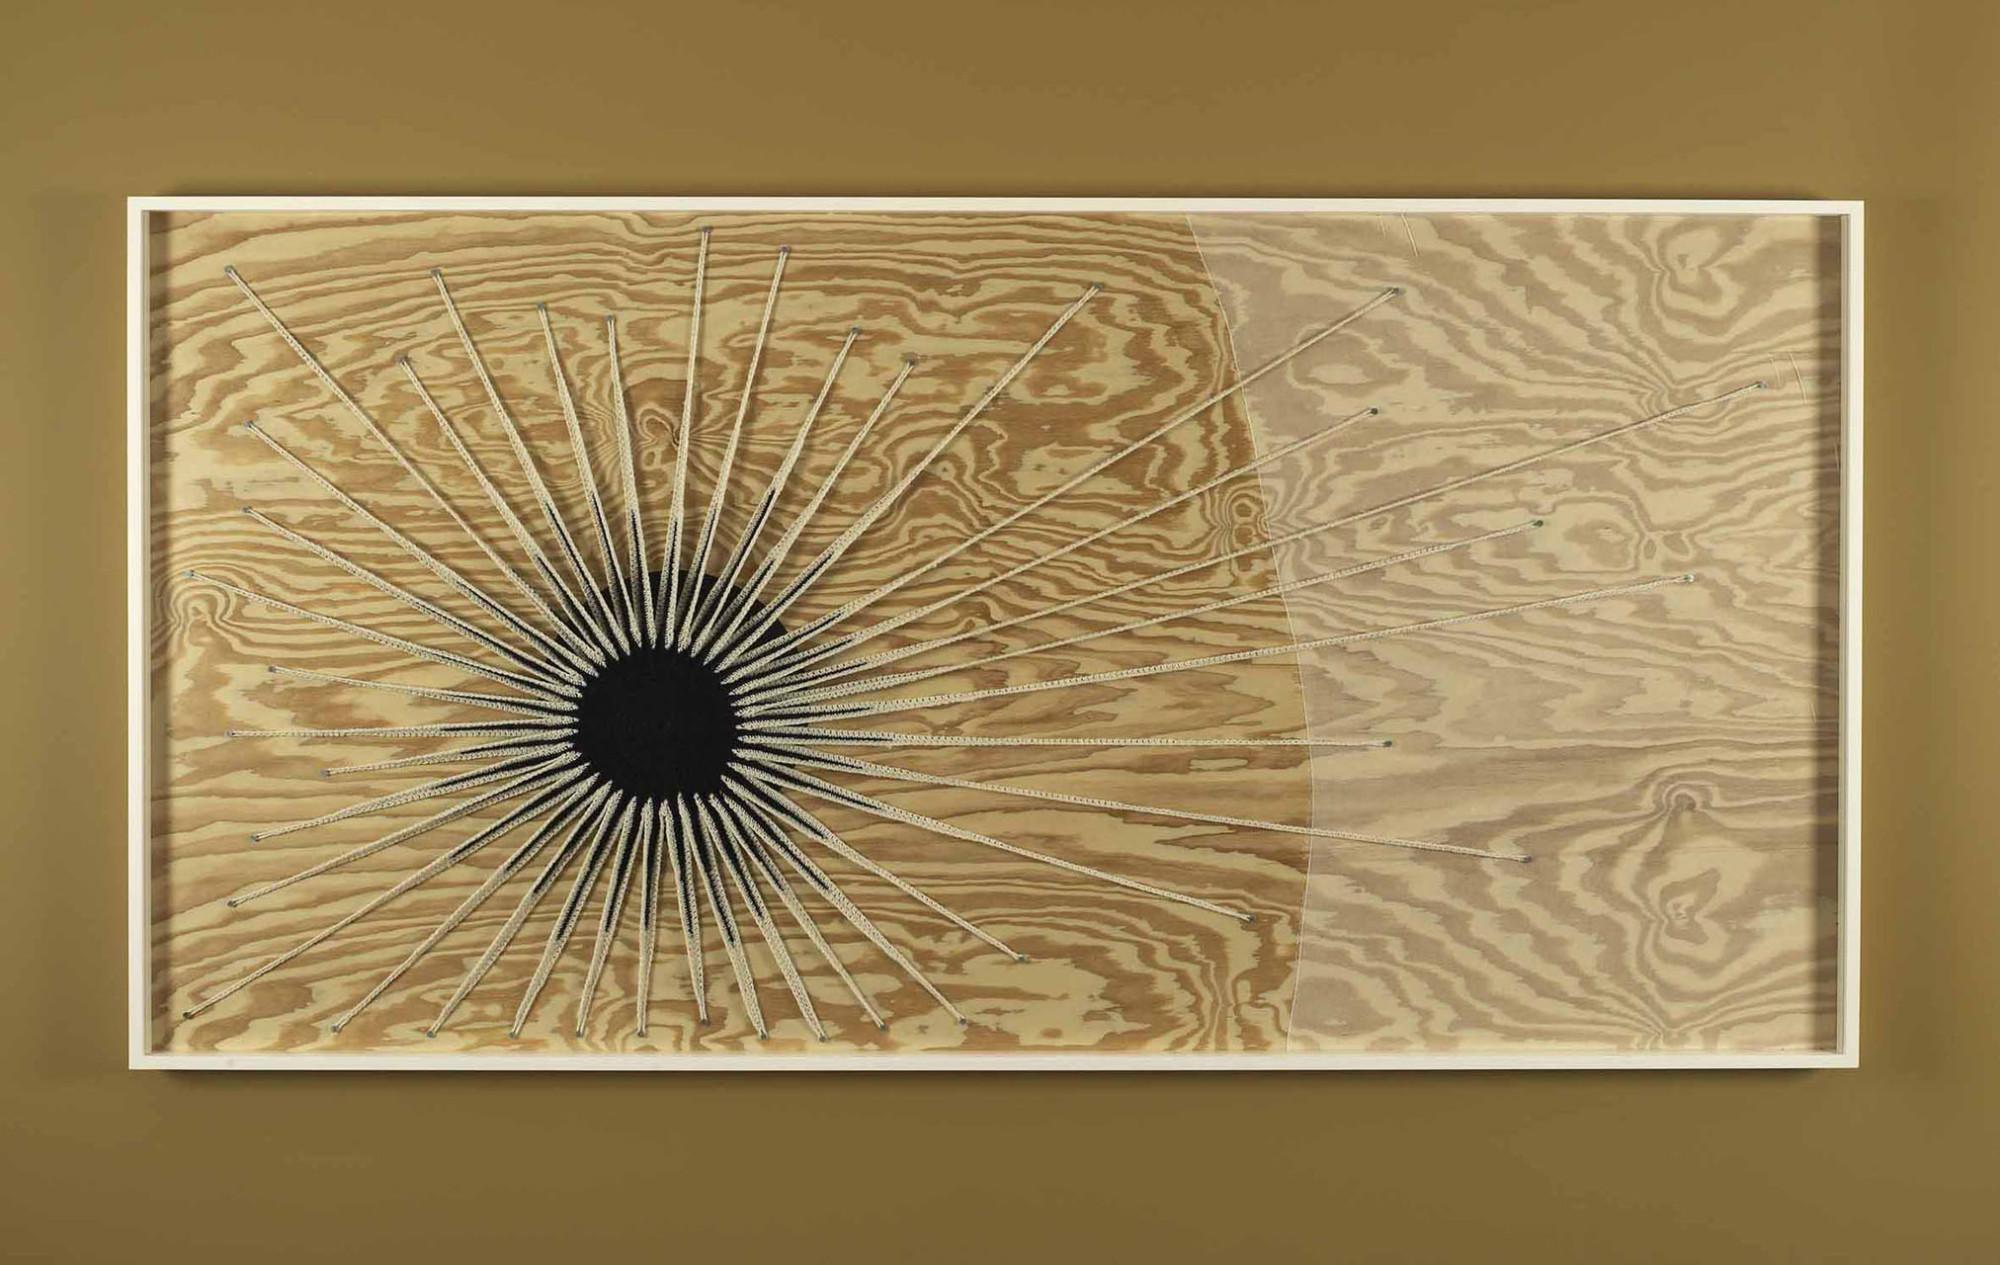 "<div class=""artwork_caption""><p>Material Manifestation: Single Strand Radiation, 2010</p></div>"